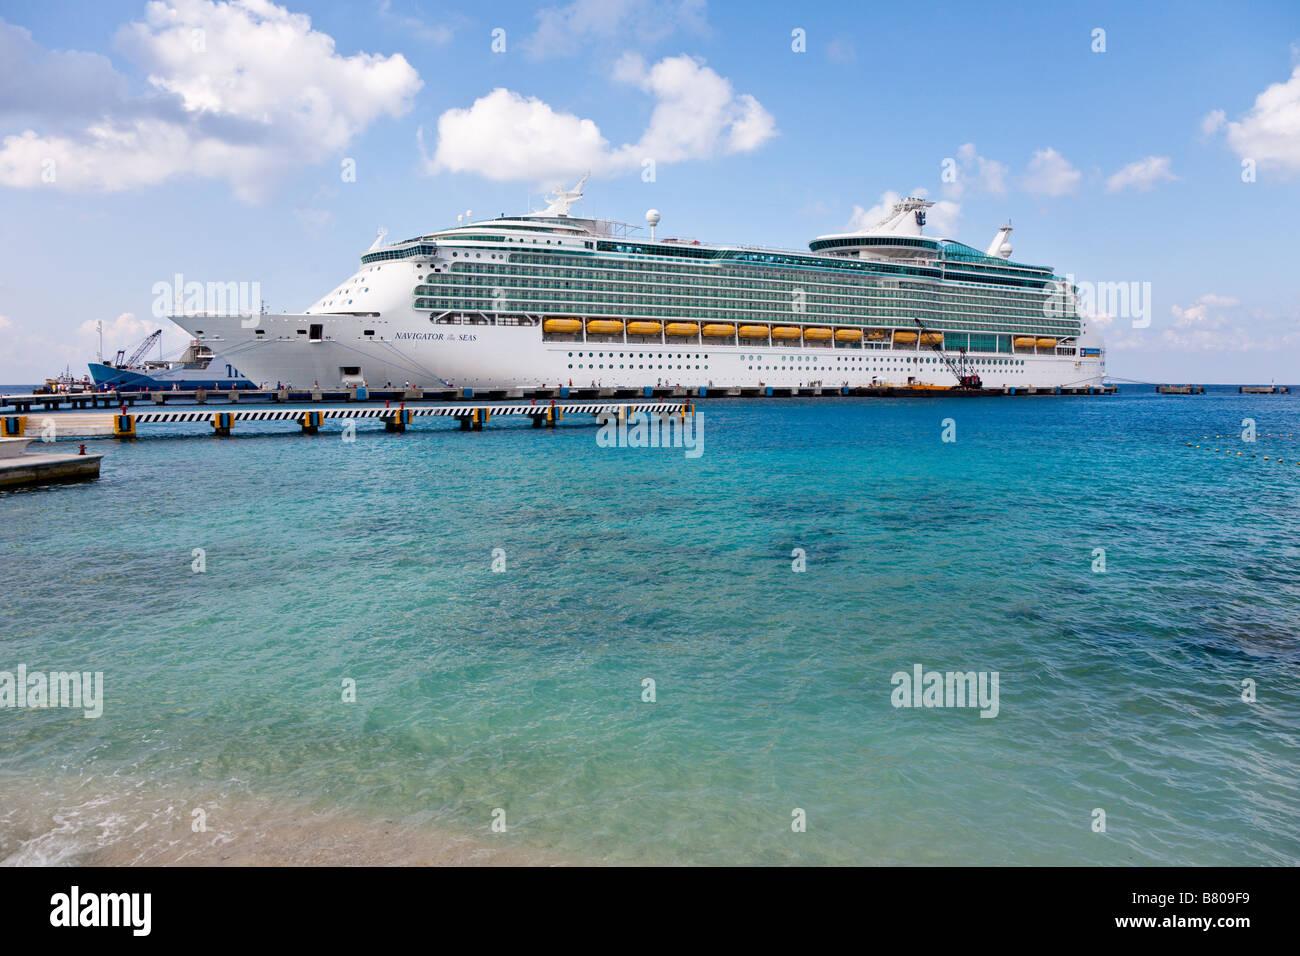 royal caribbean navigator of the seas docked at the port of